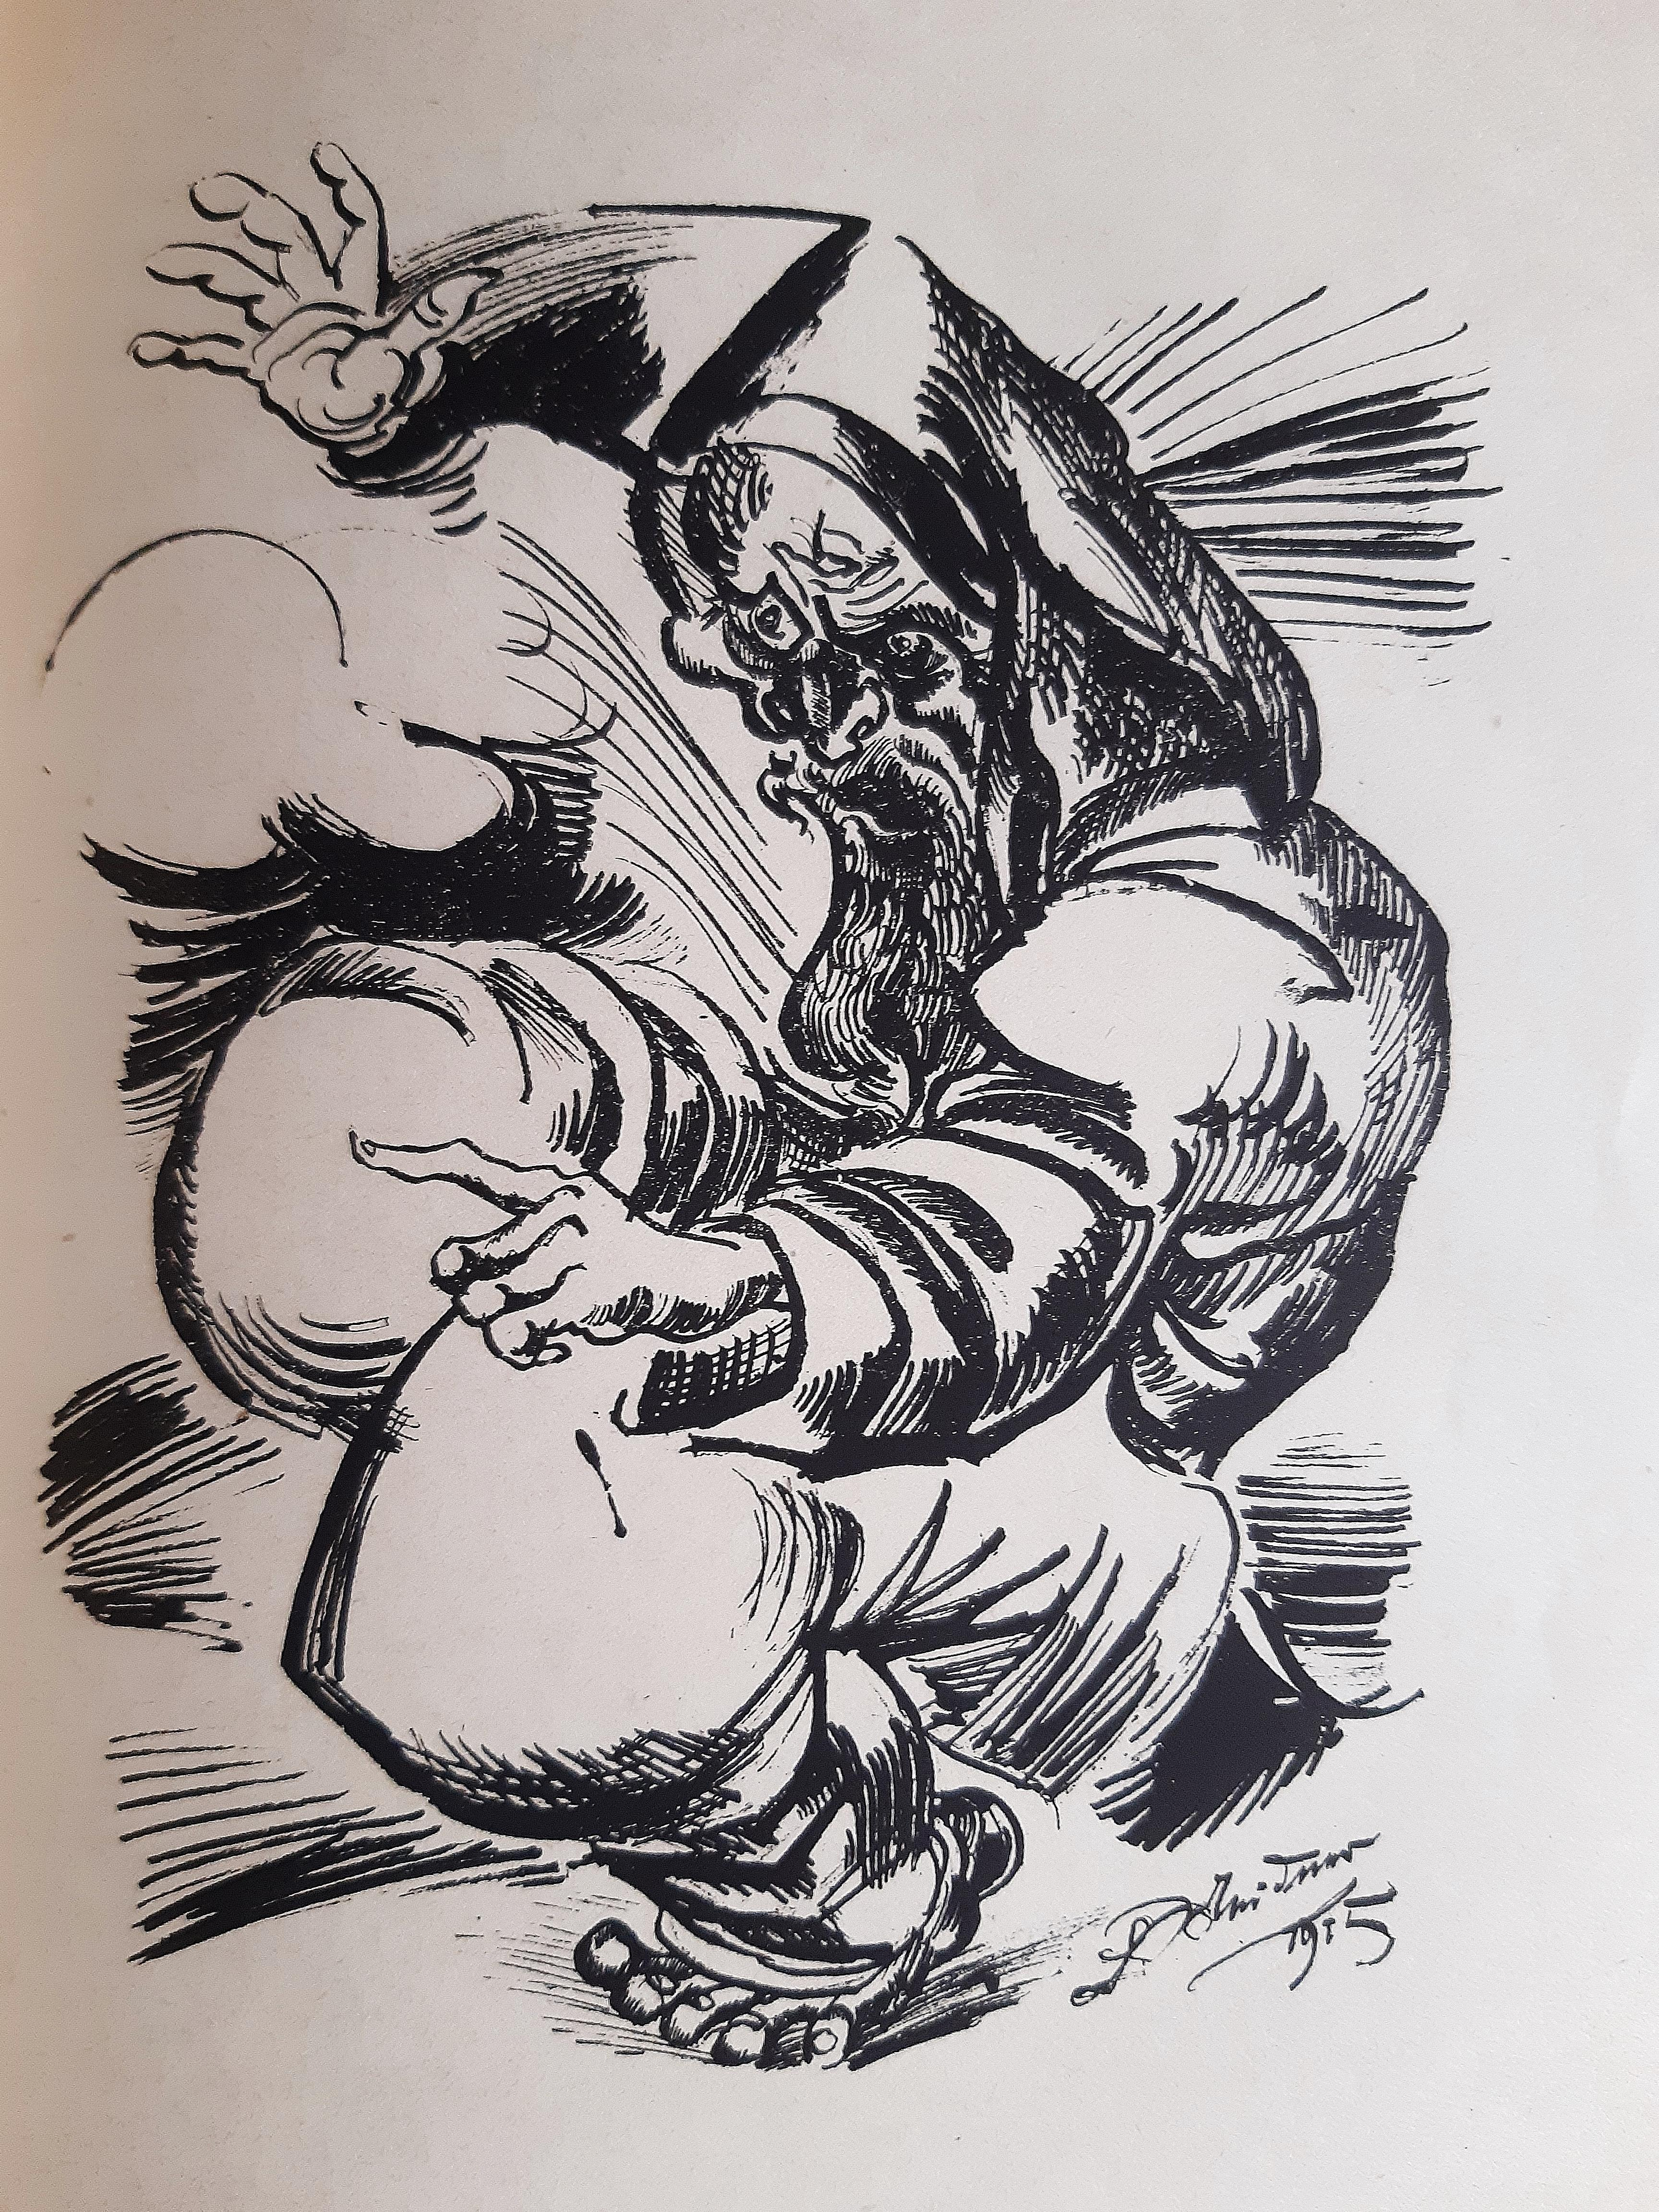 Im Nachen das Sternemeer - Rare book Illustrated by Ludwig Meidner - 1918